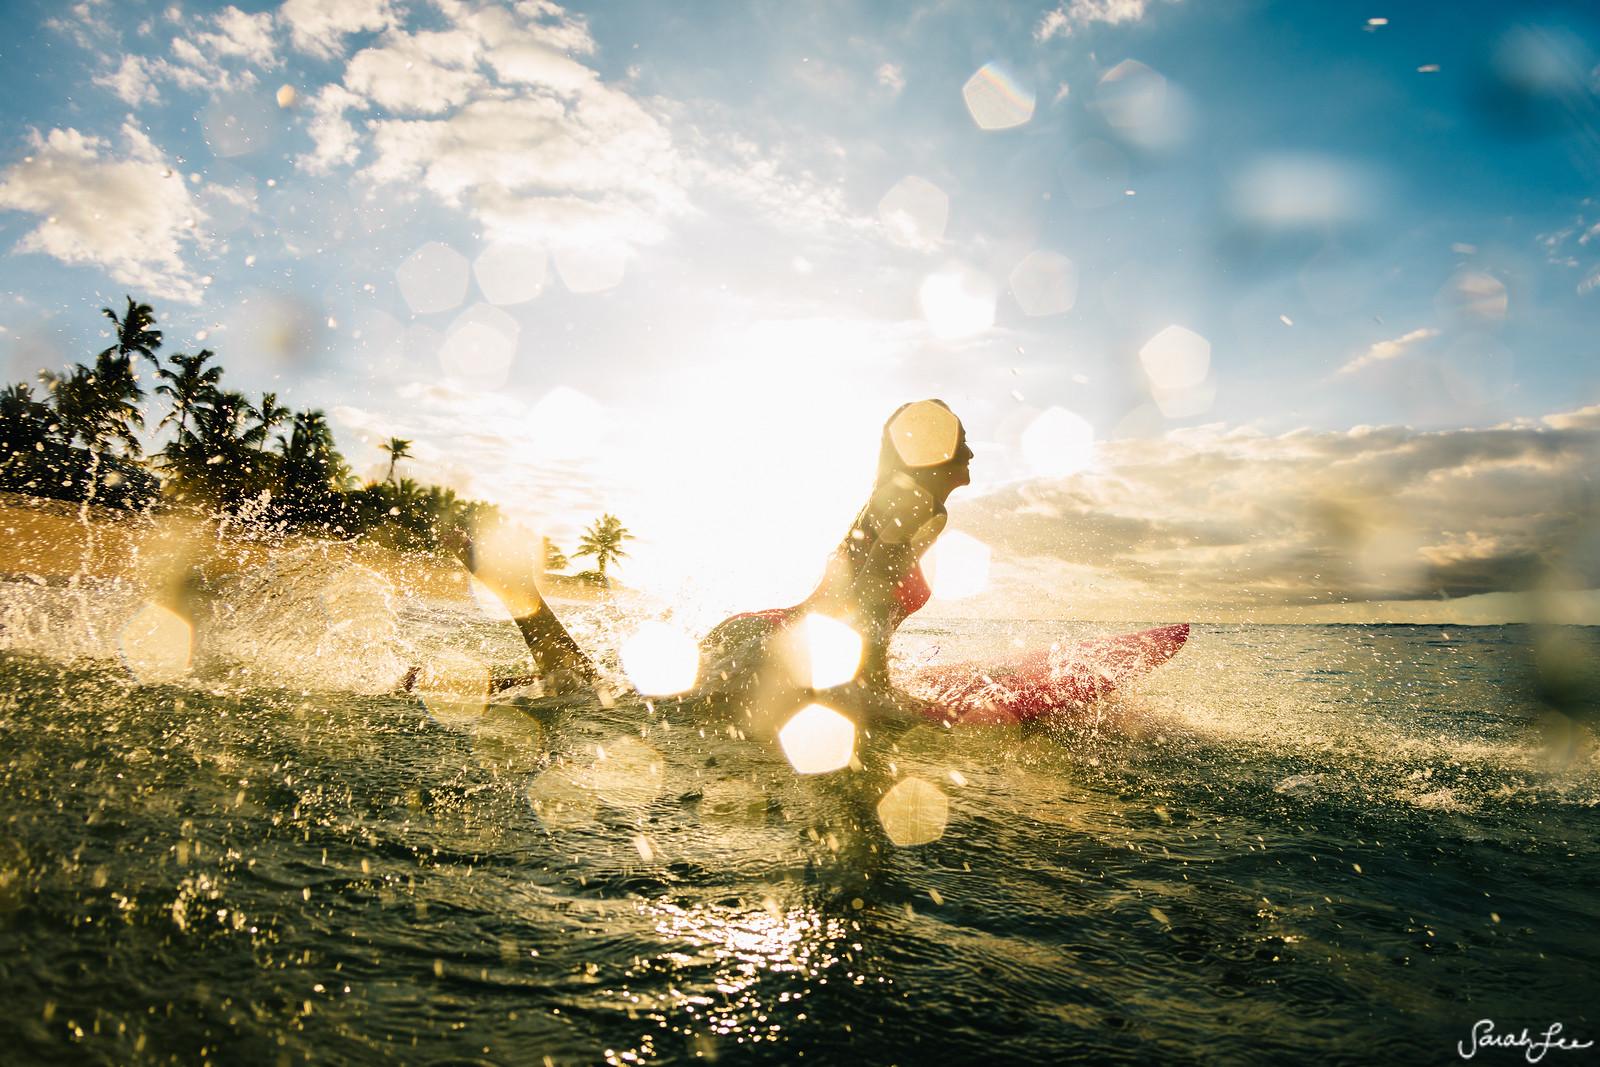 DAY 4:  VAYU -AIR -ANAHATA HEART OPENING  -MORNING HEART OPENING YOGA CLASS  -VEGAN COOKING WORKSHOP  -PLAYA LA SALADITA SURF SESSION  -LOCAL CAVE EXPLORATION  -MEDITATIVE SUNSET YIN YOGA CLASS